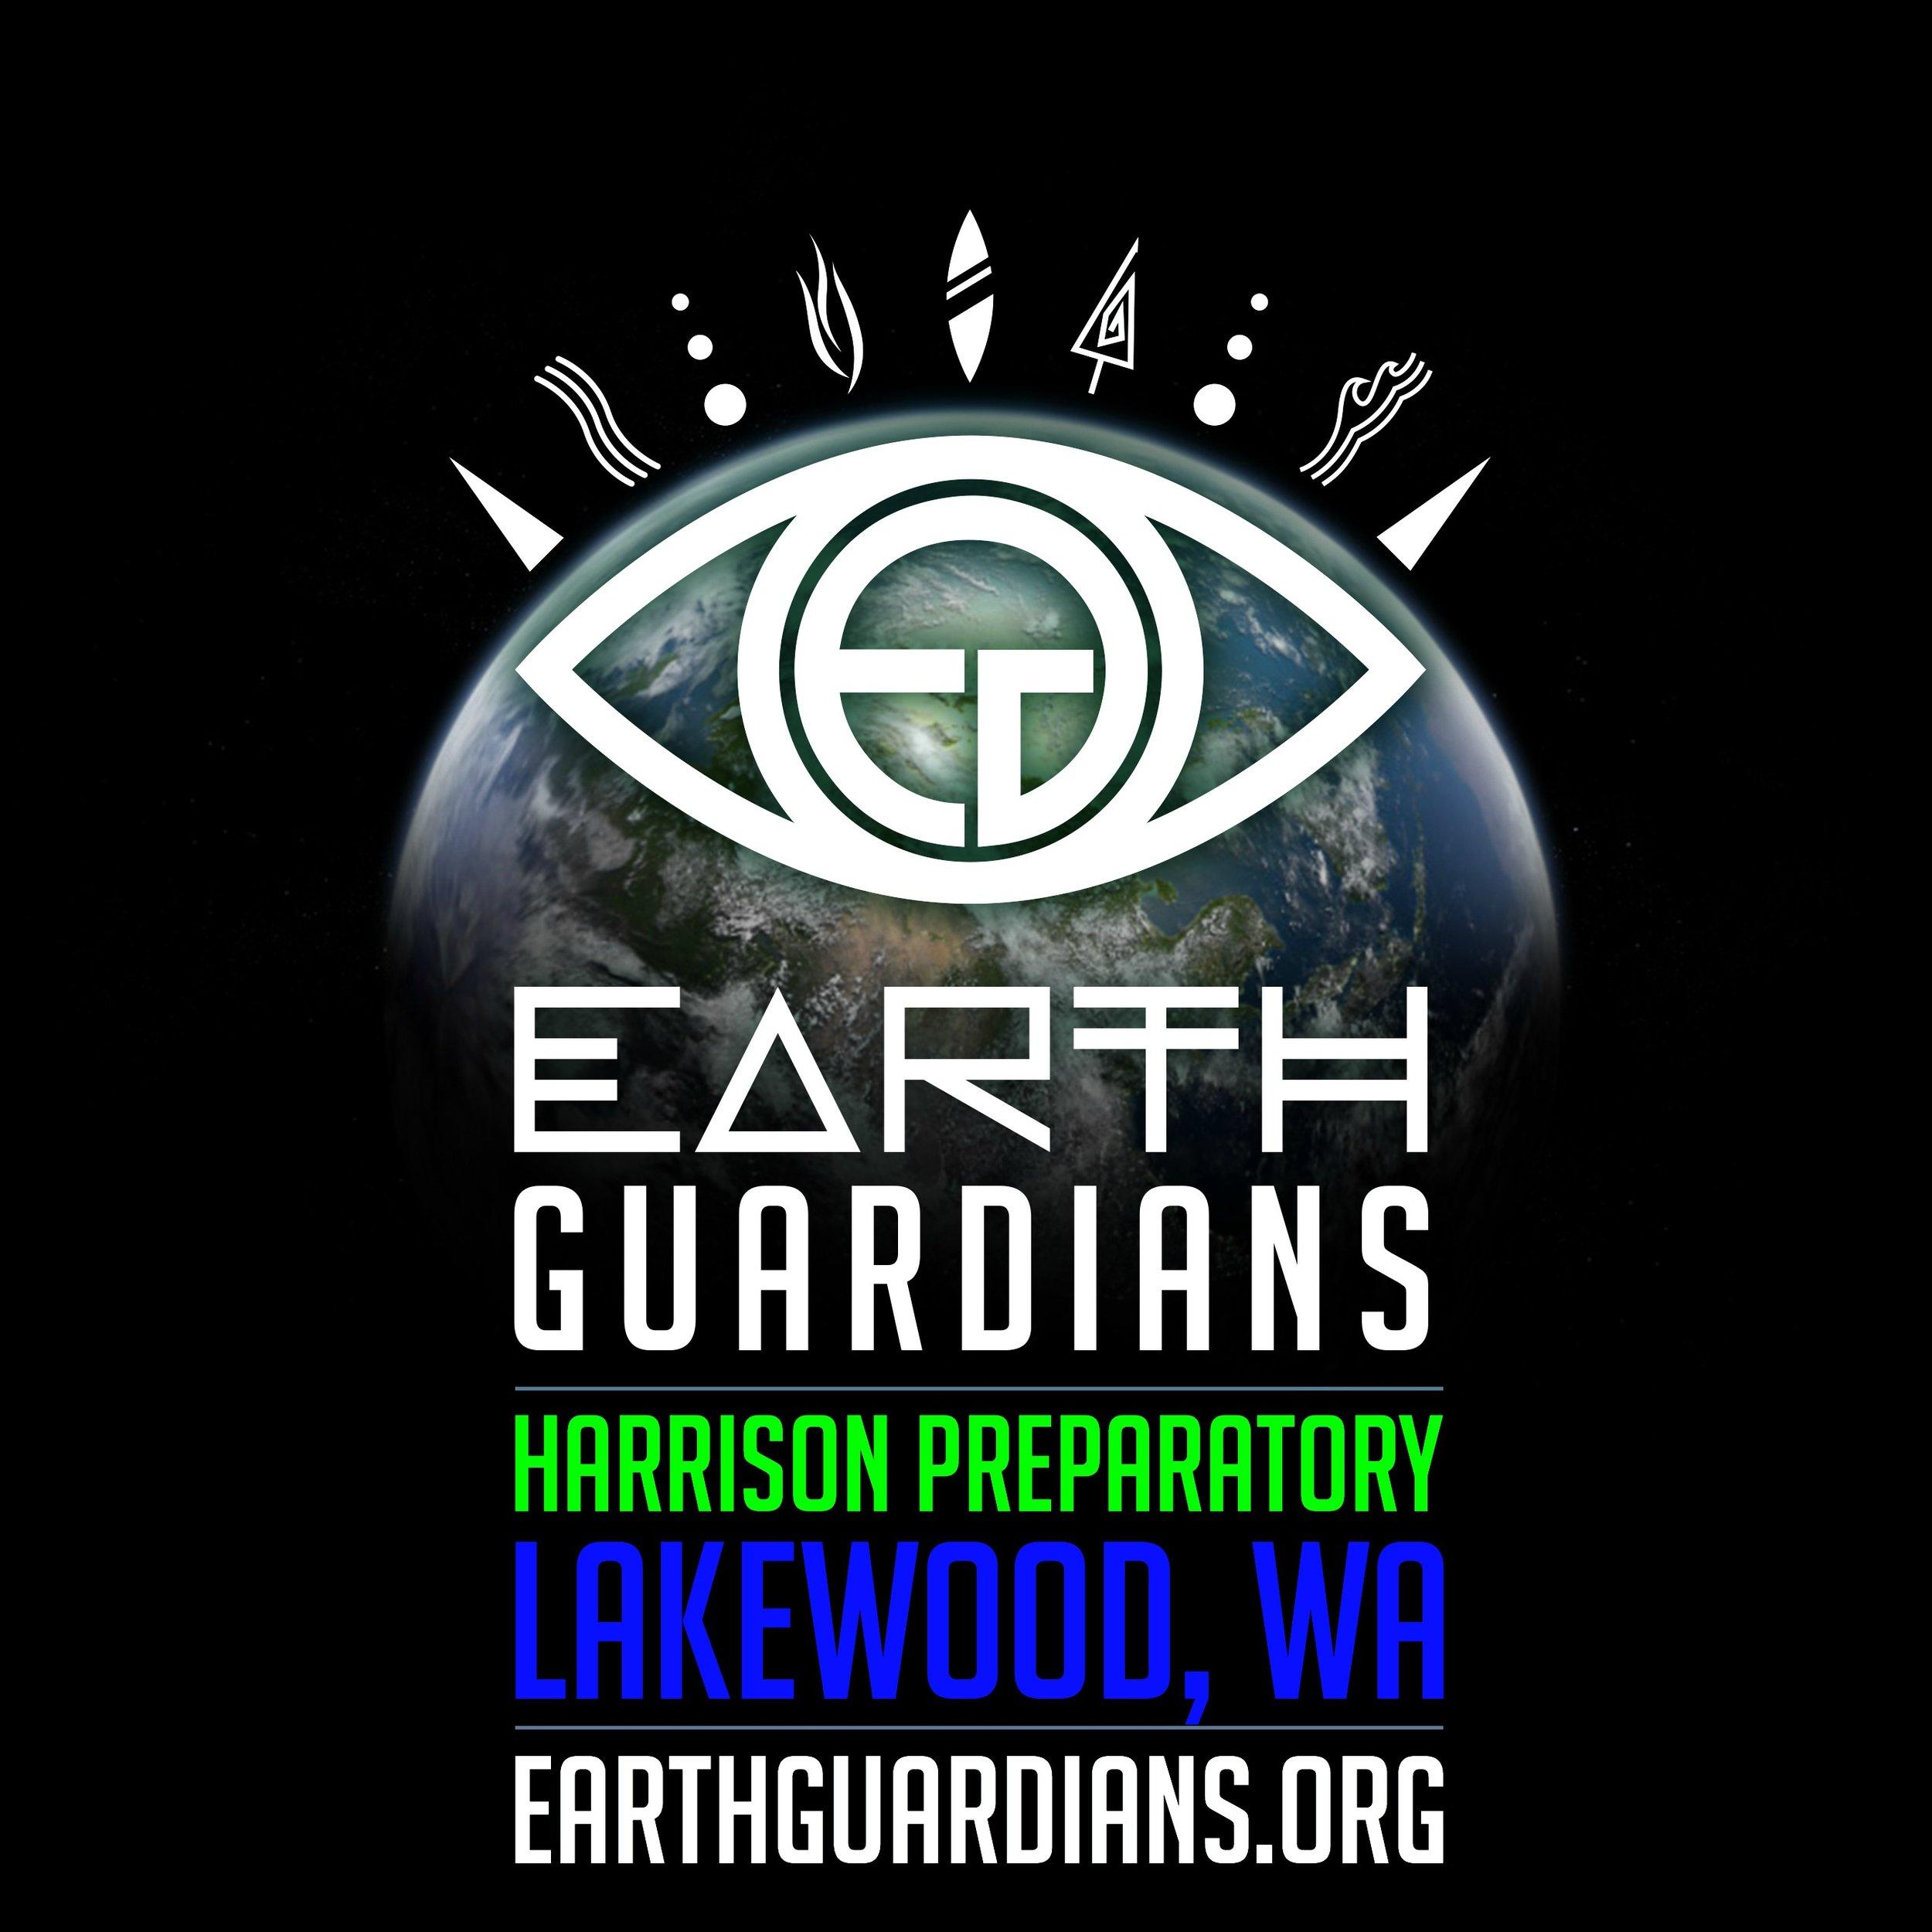 EG_crew logo Harrison Preparatory.jpg